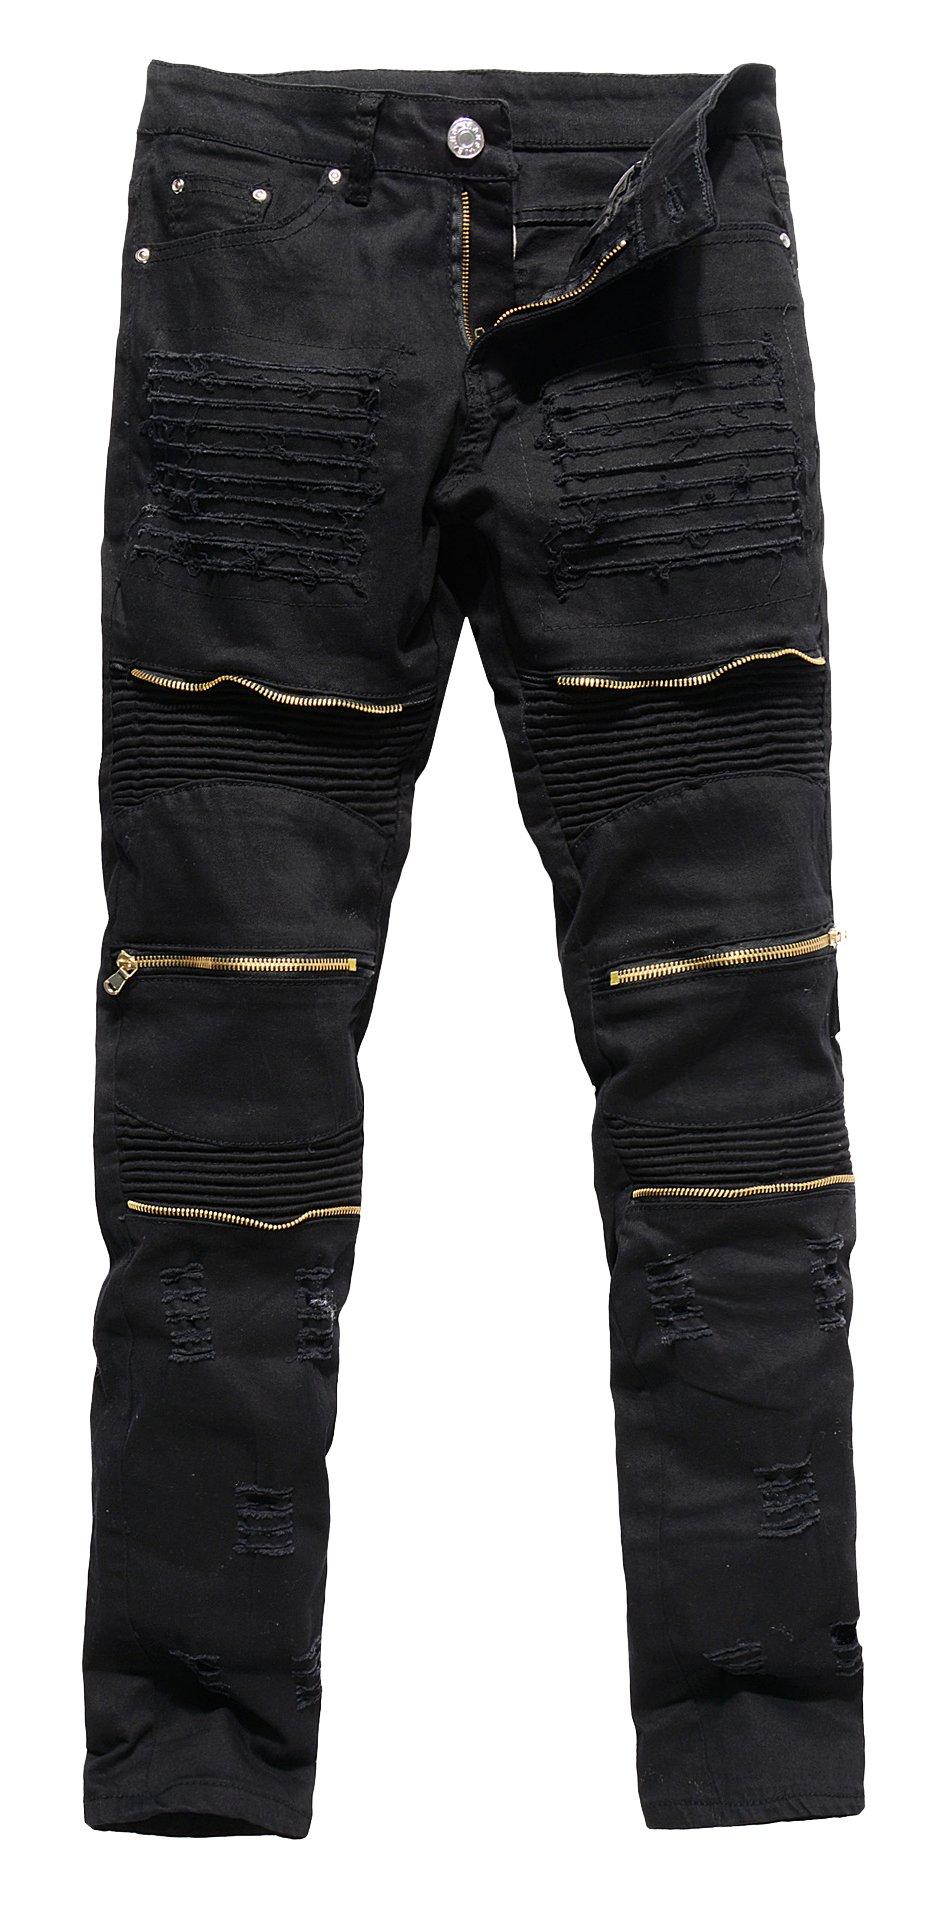 COLINNA Men's Vintage Distressed Ripped Biker Moto Denim Pants Slim Fit Zipper Jeans